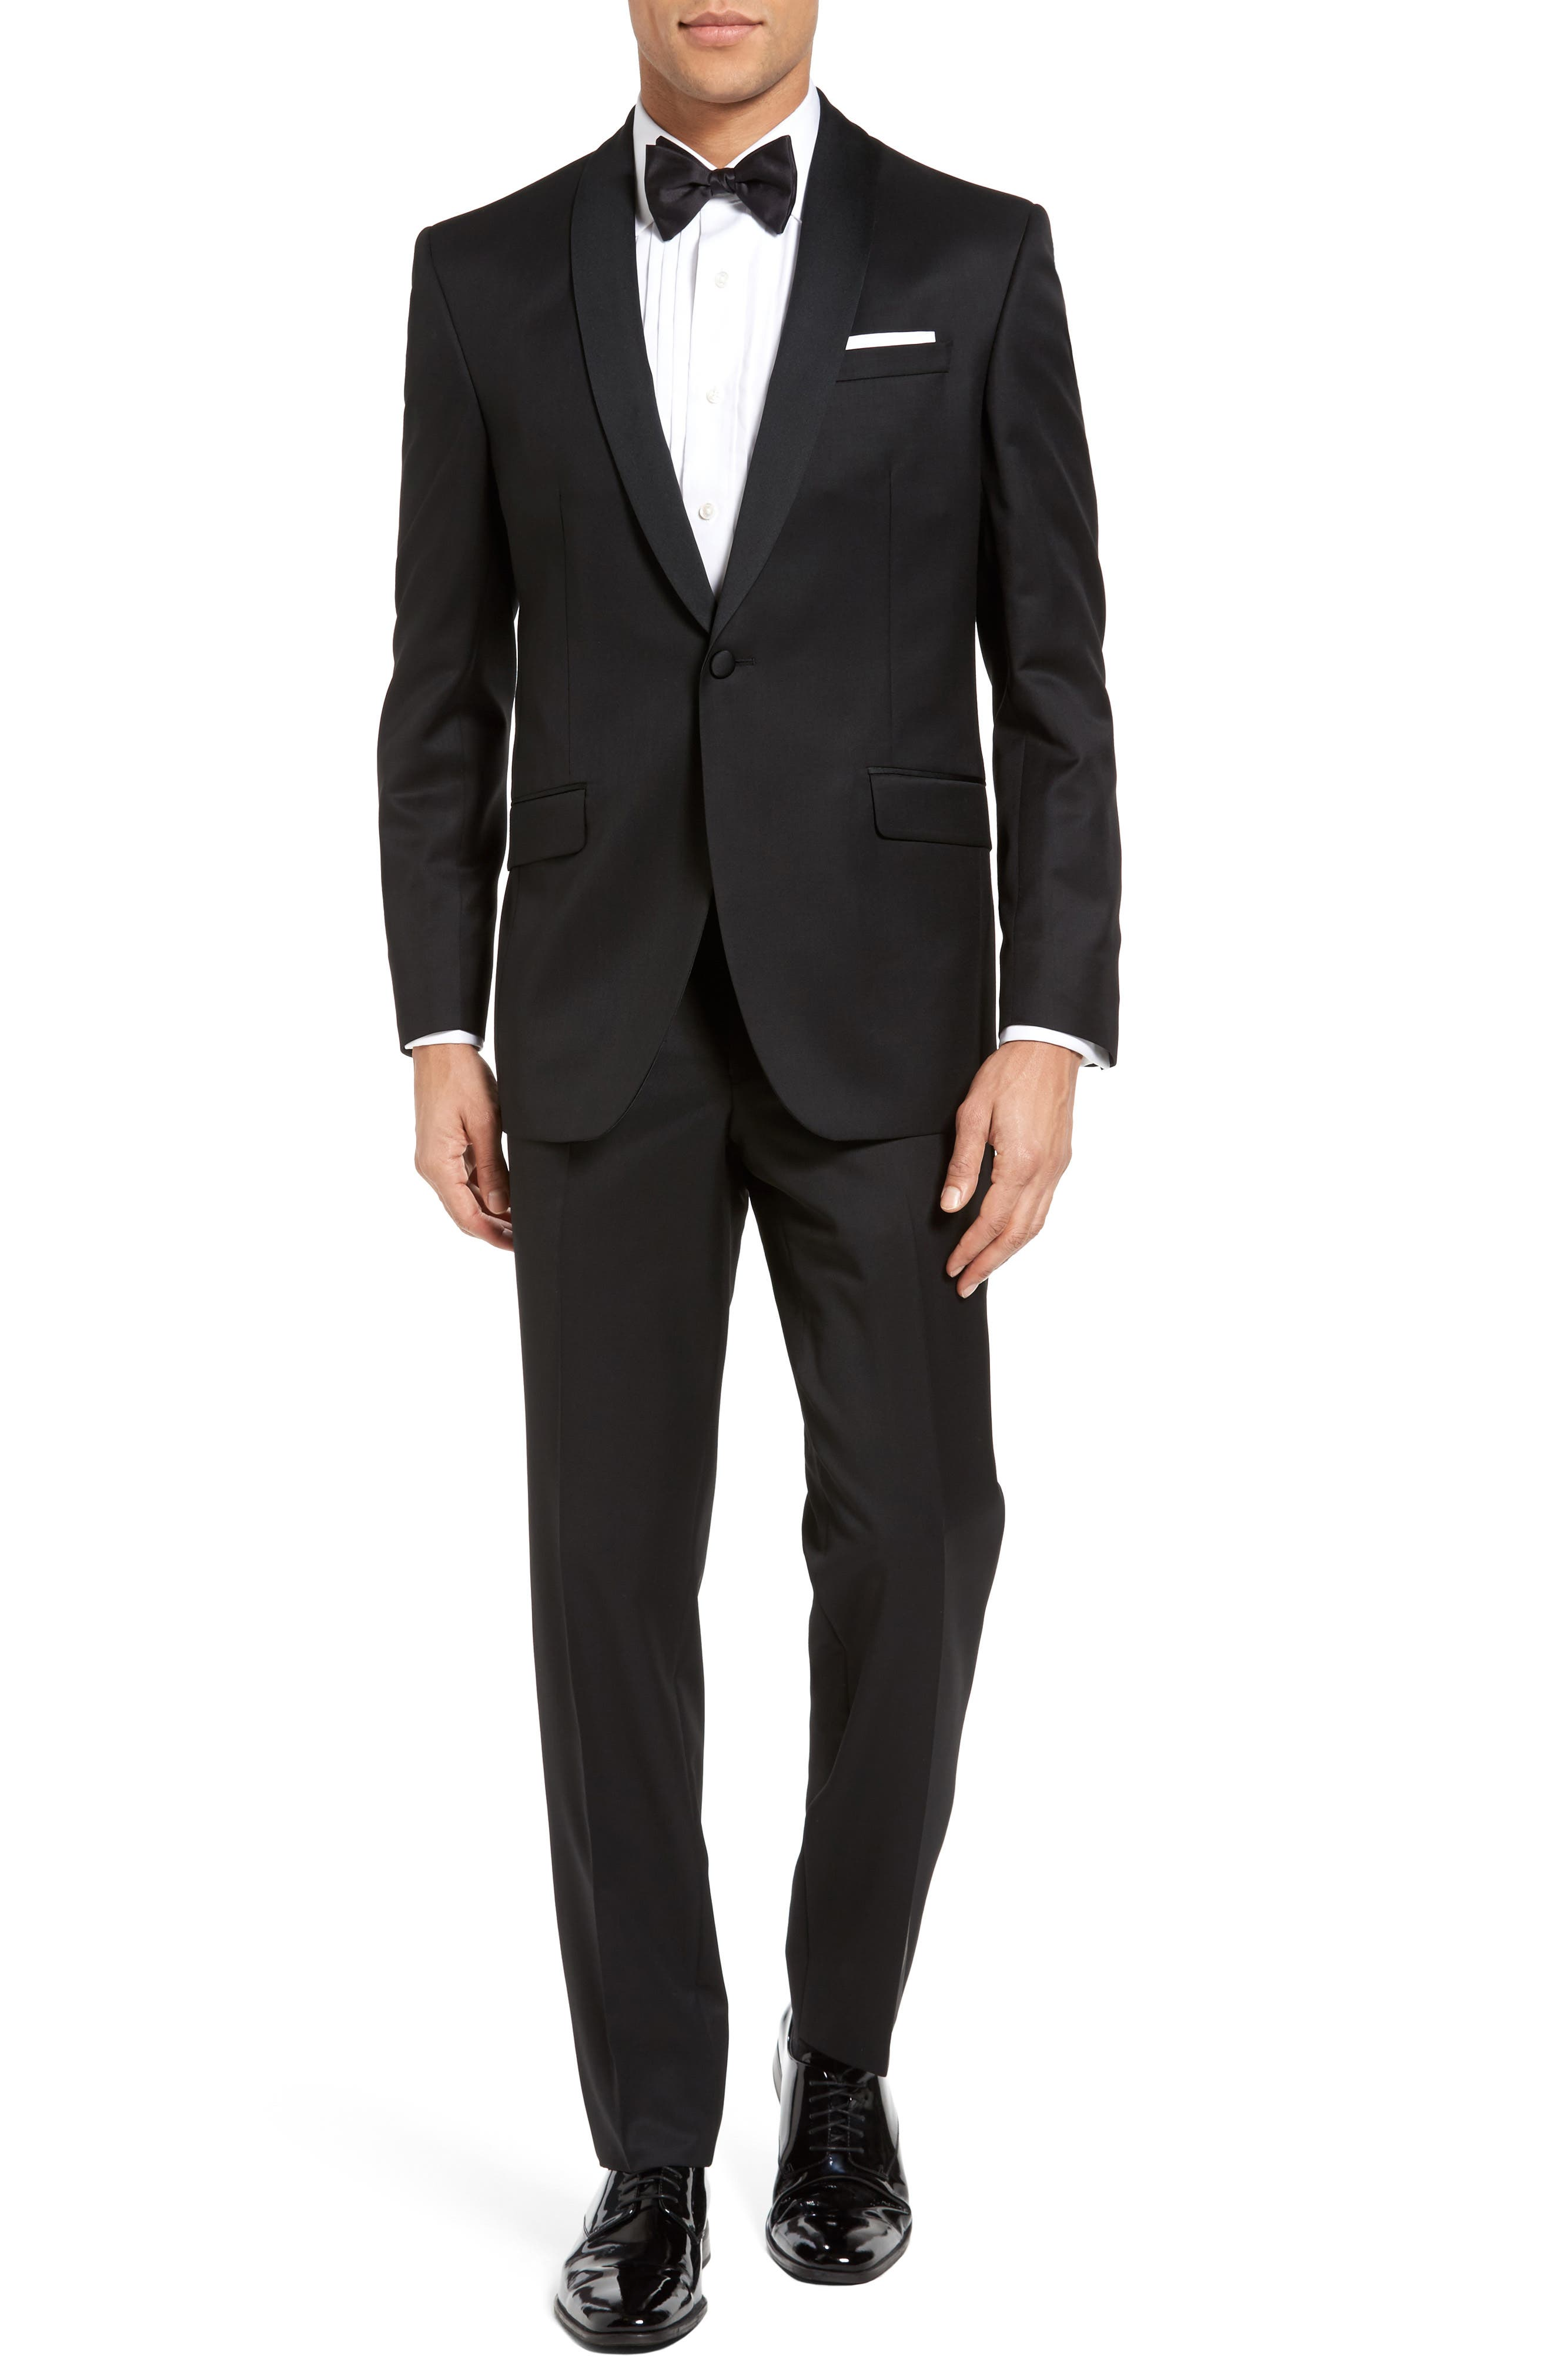 Josh Trim Fit Wool & Mohair Tuxedo,                             Main thumbnail 1, color,                             BLACK